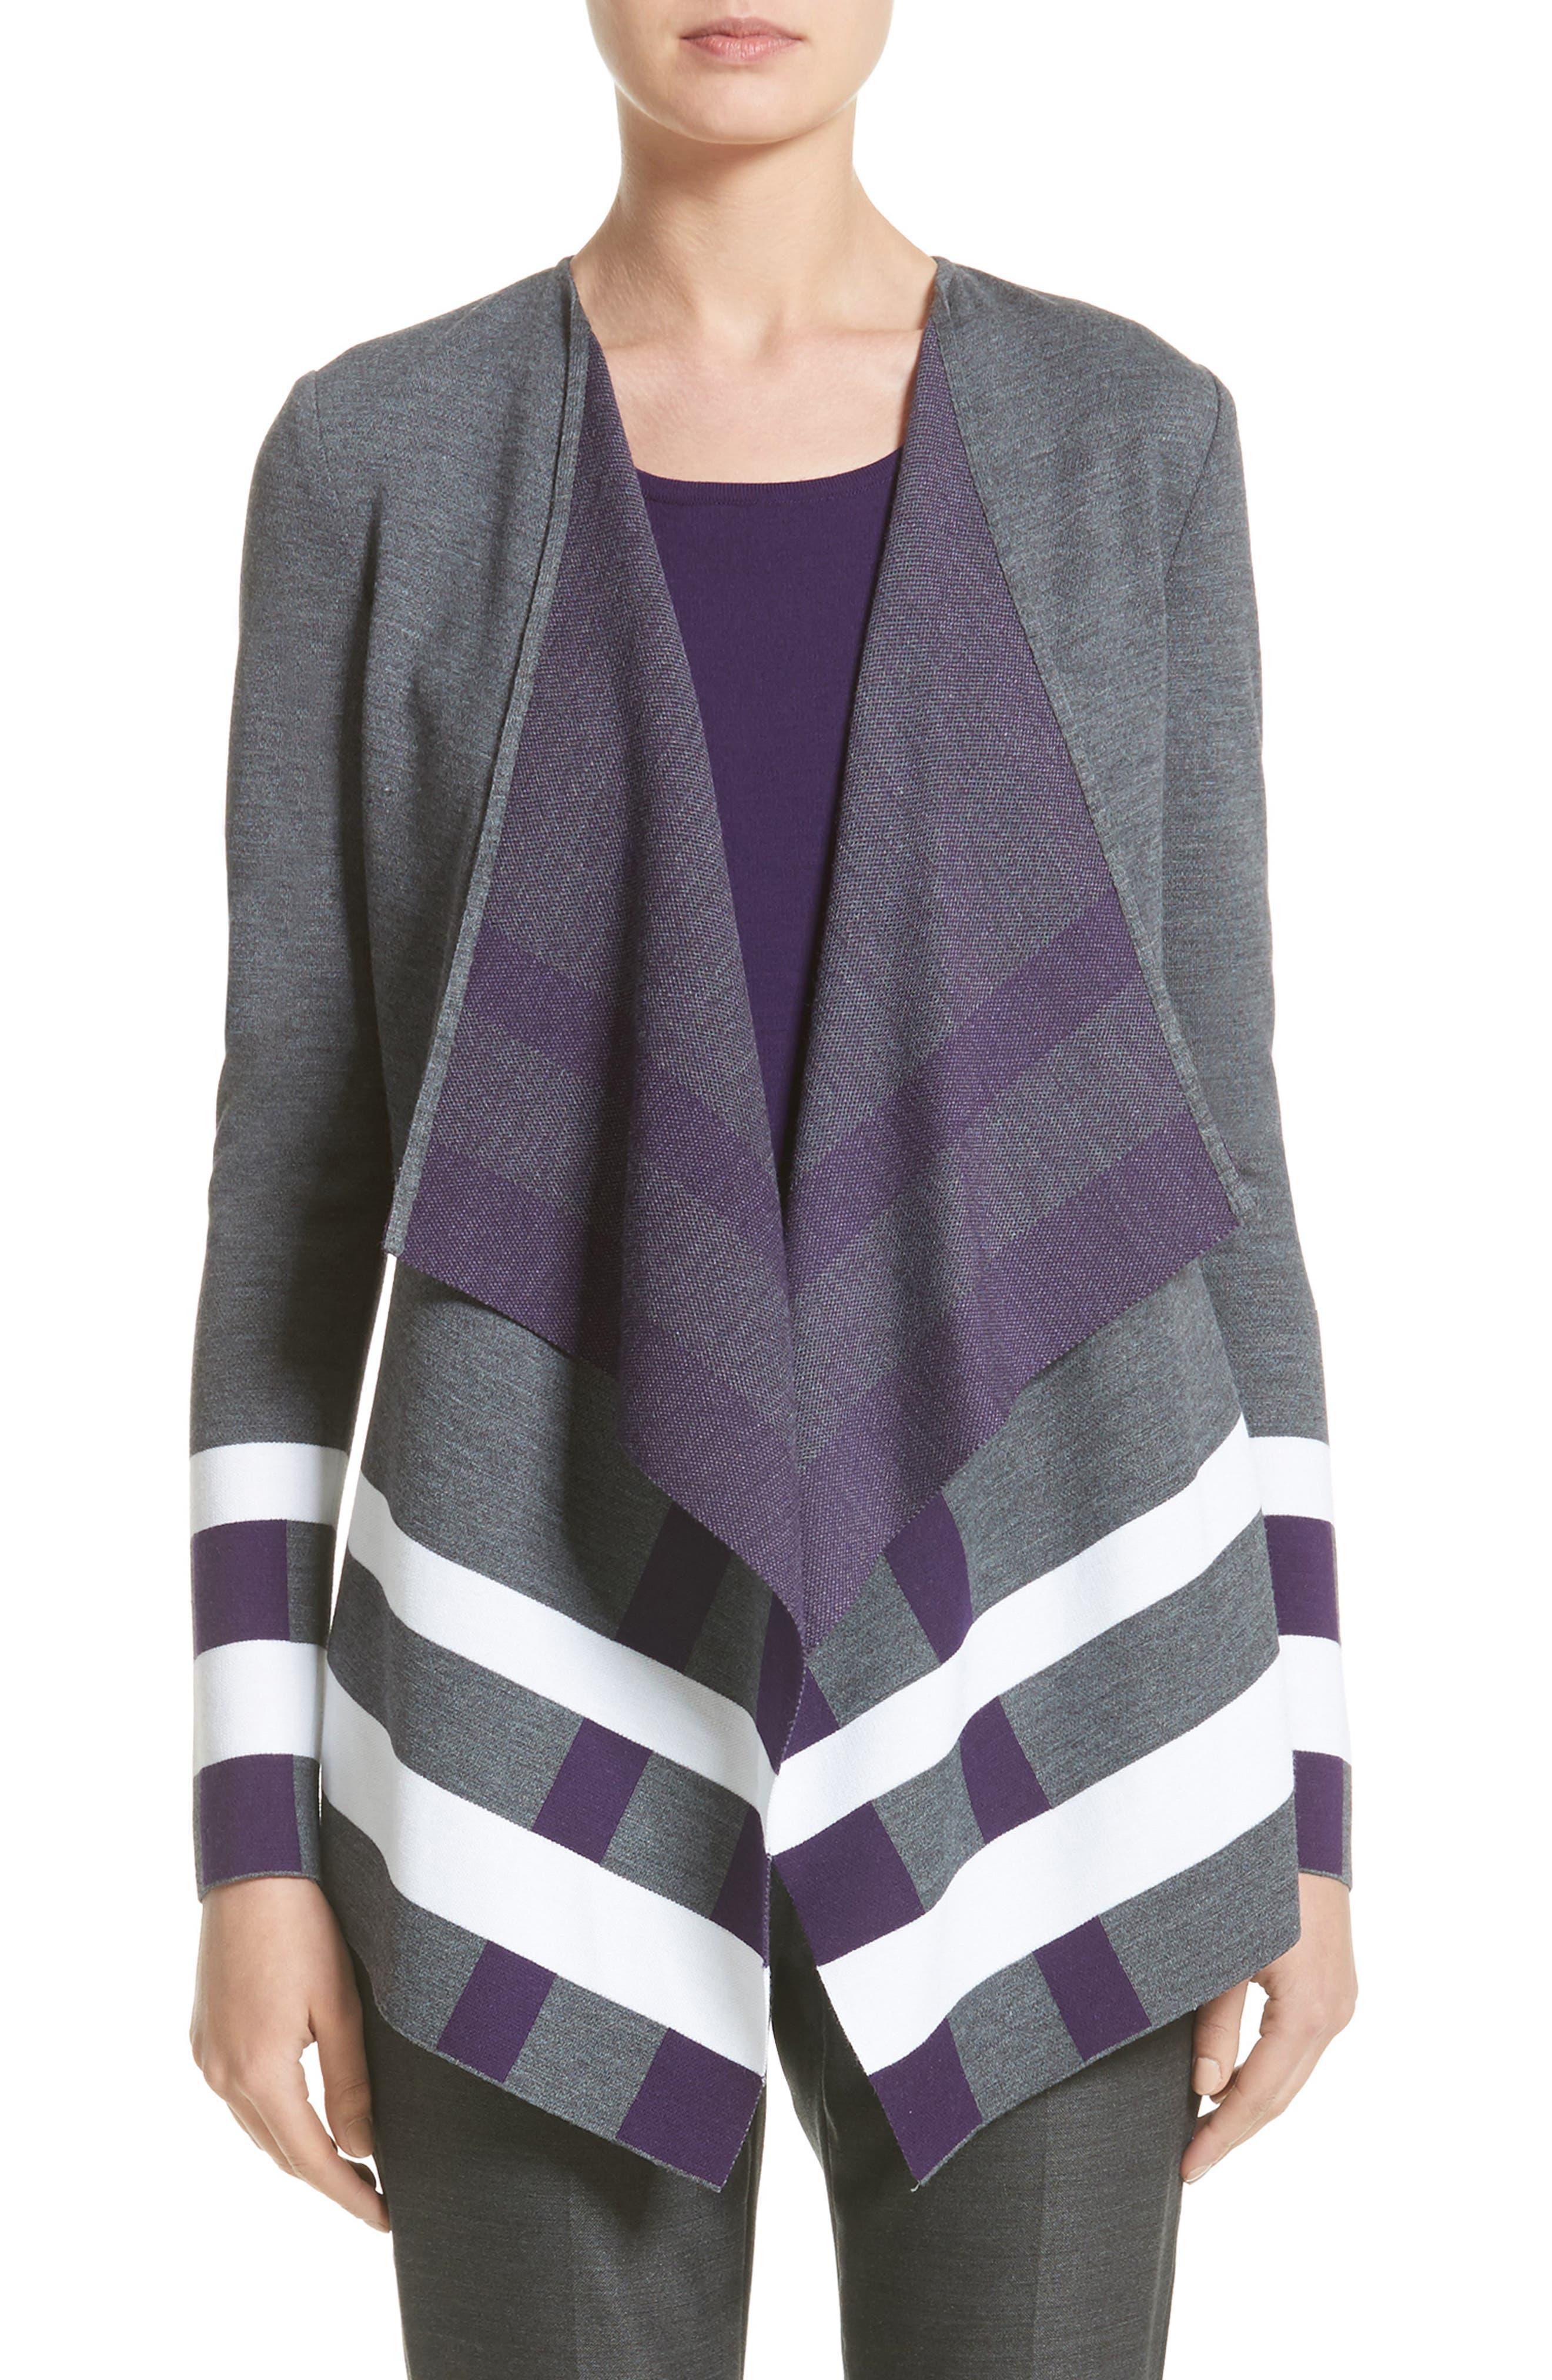 Milano Knit Jacquard Drape Front Jacket,                         Main,                         color, 030